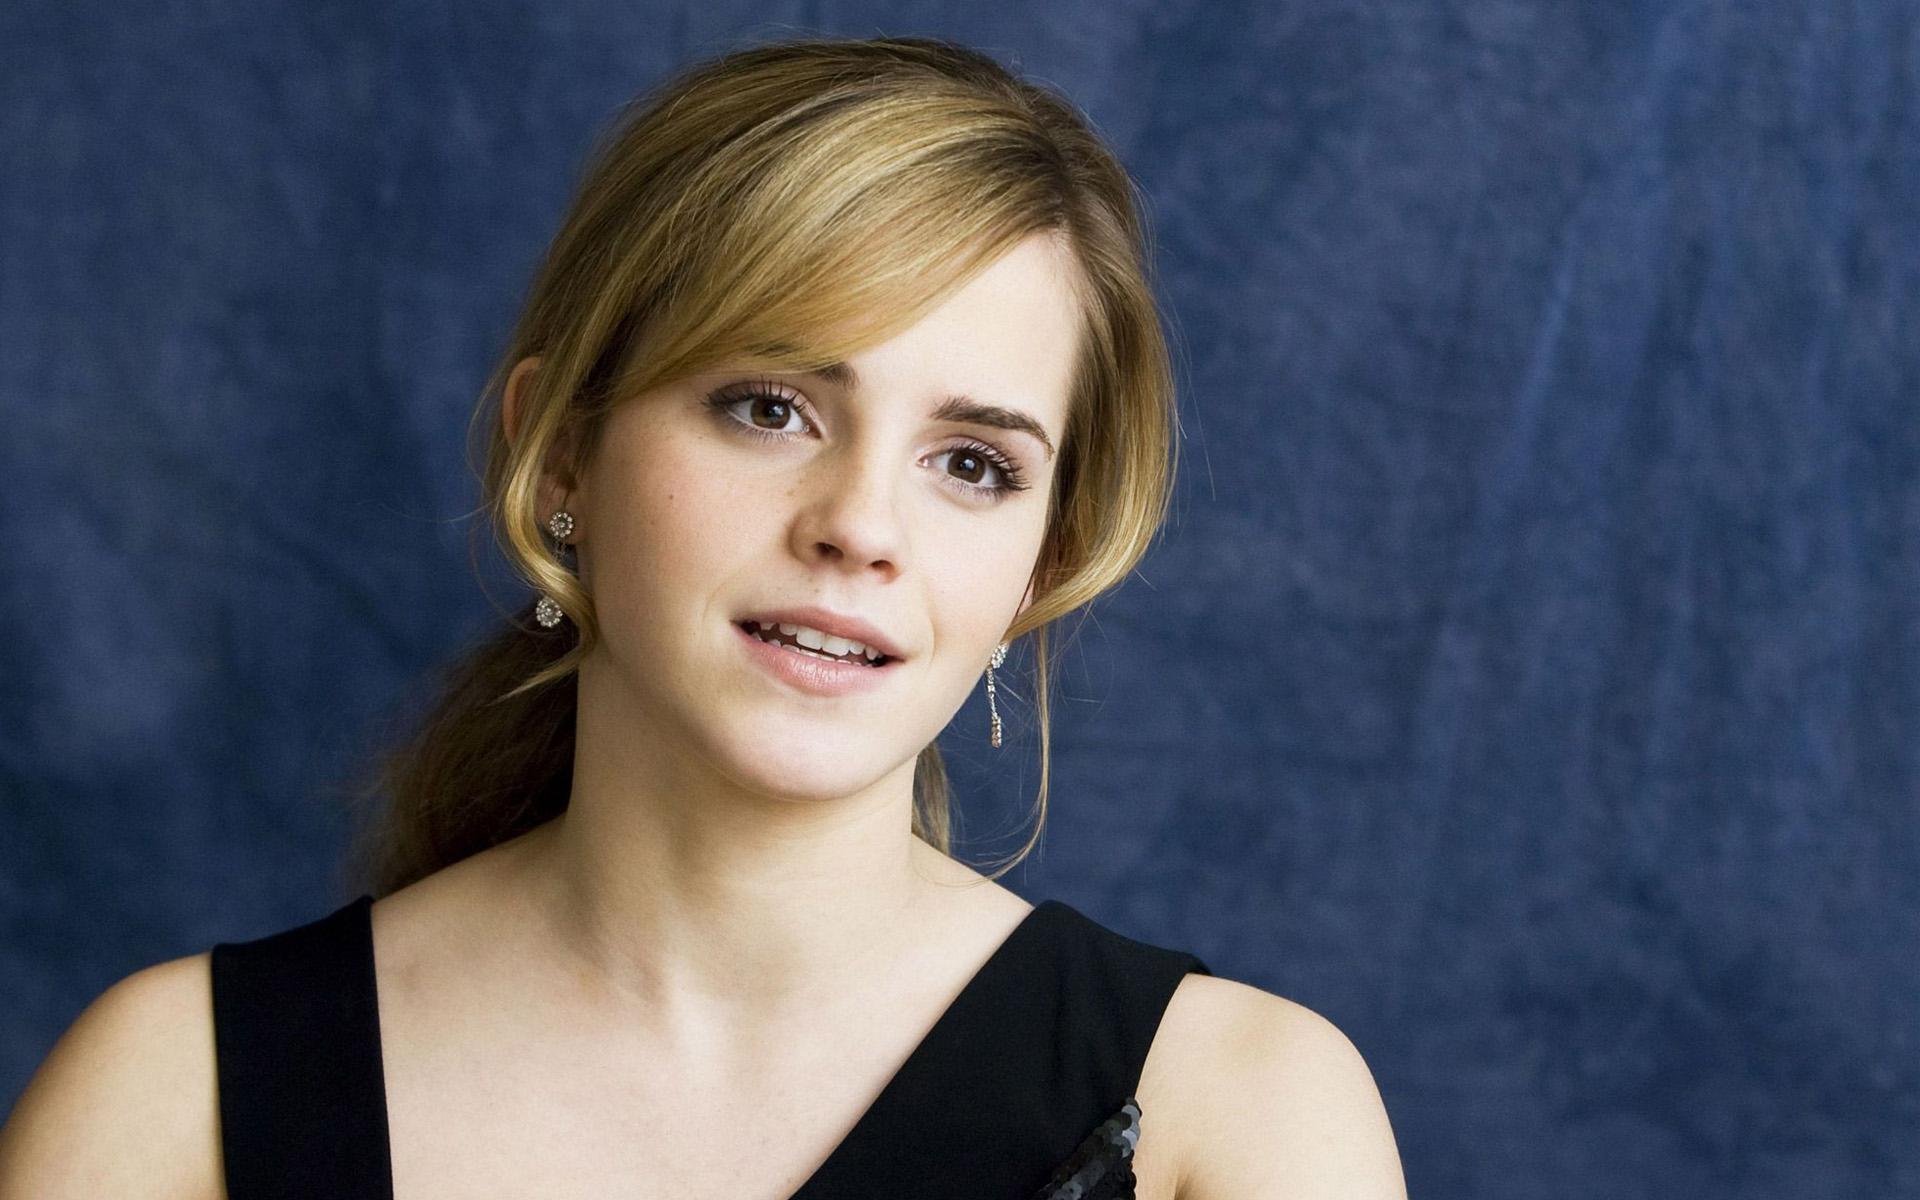 Emma Watson Hd Wallpapers 1080P 1920x1200